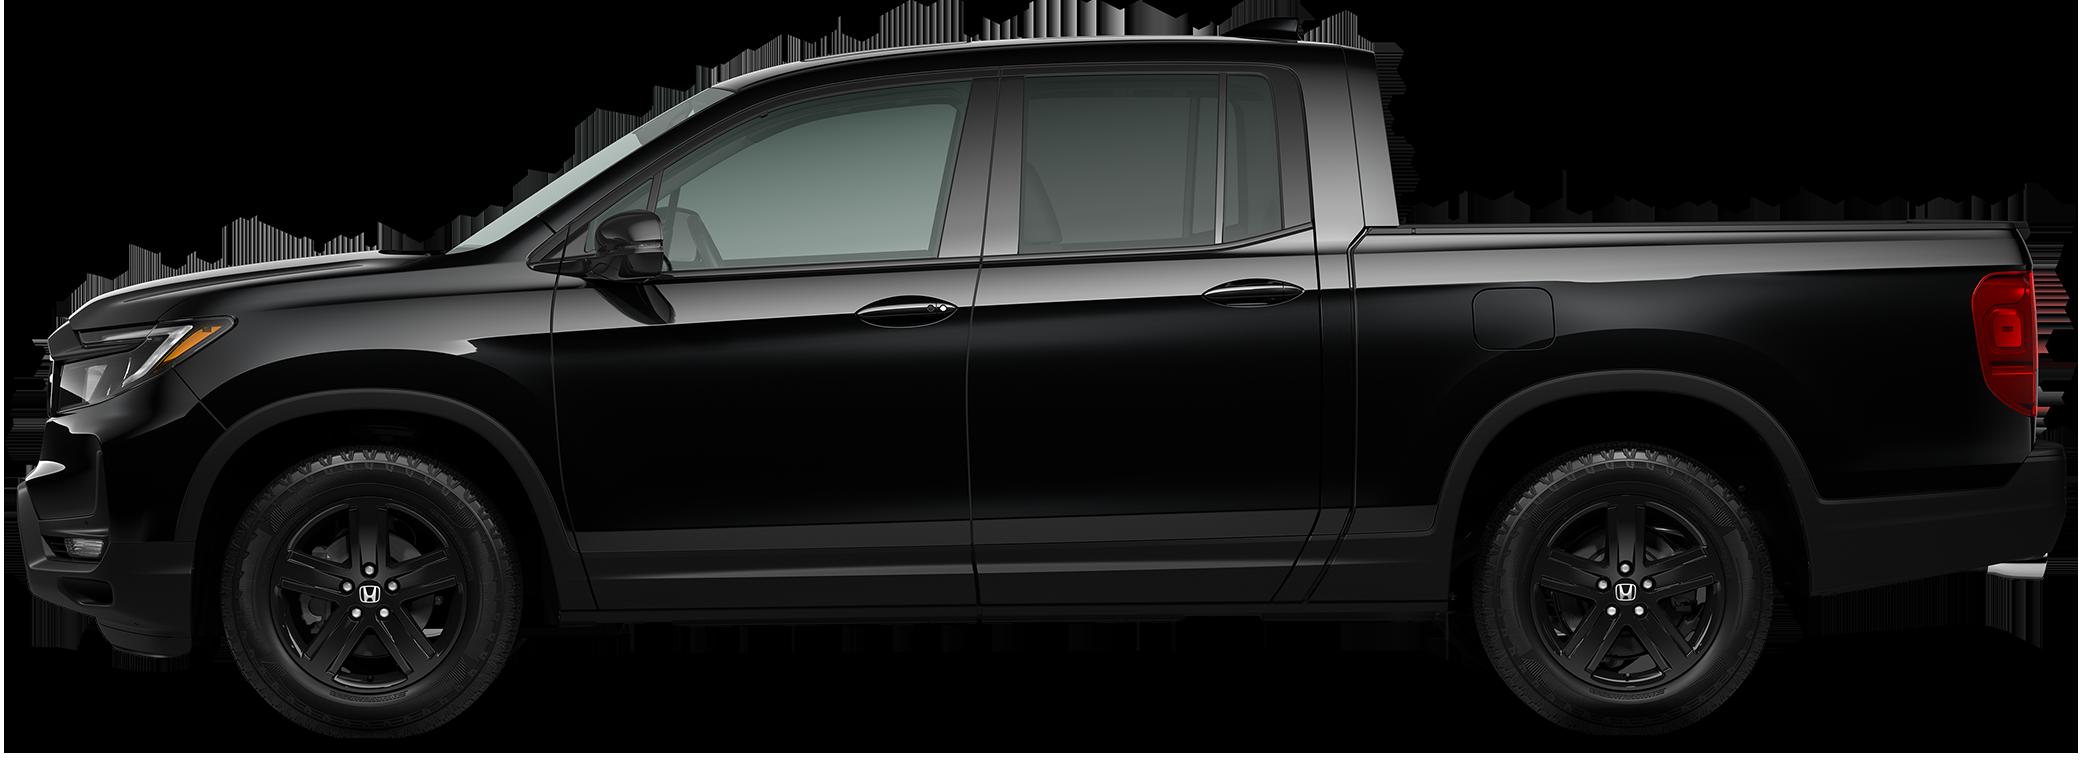 2021 Honda Ridgeline Truck Black Edition